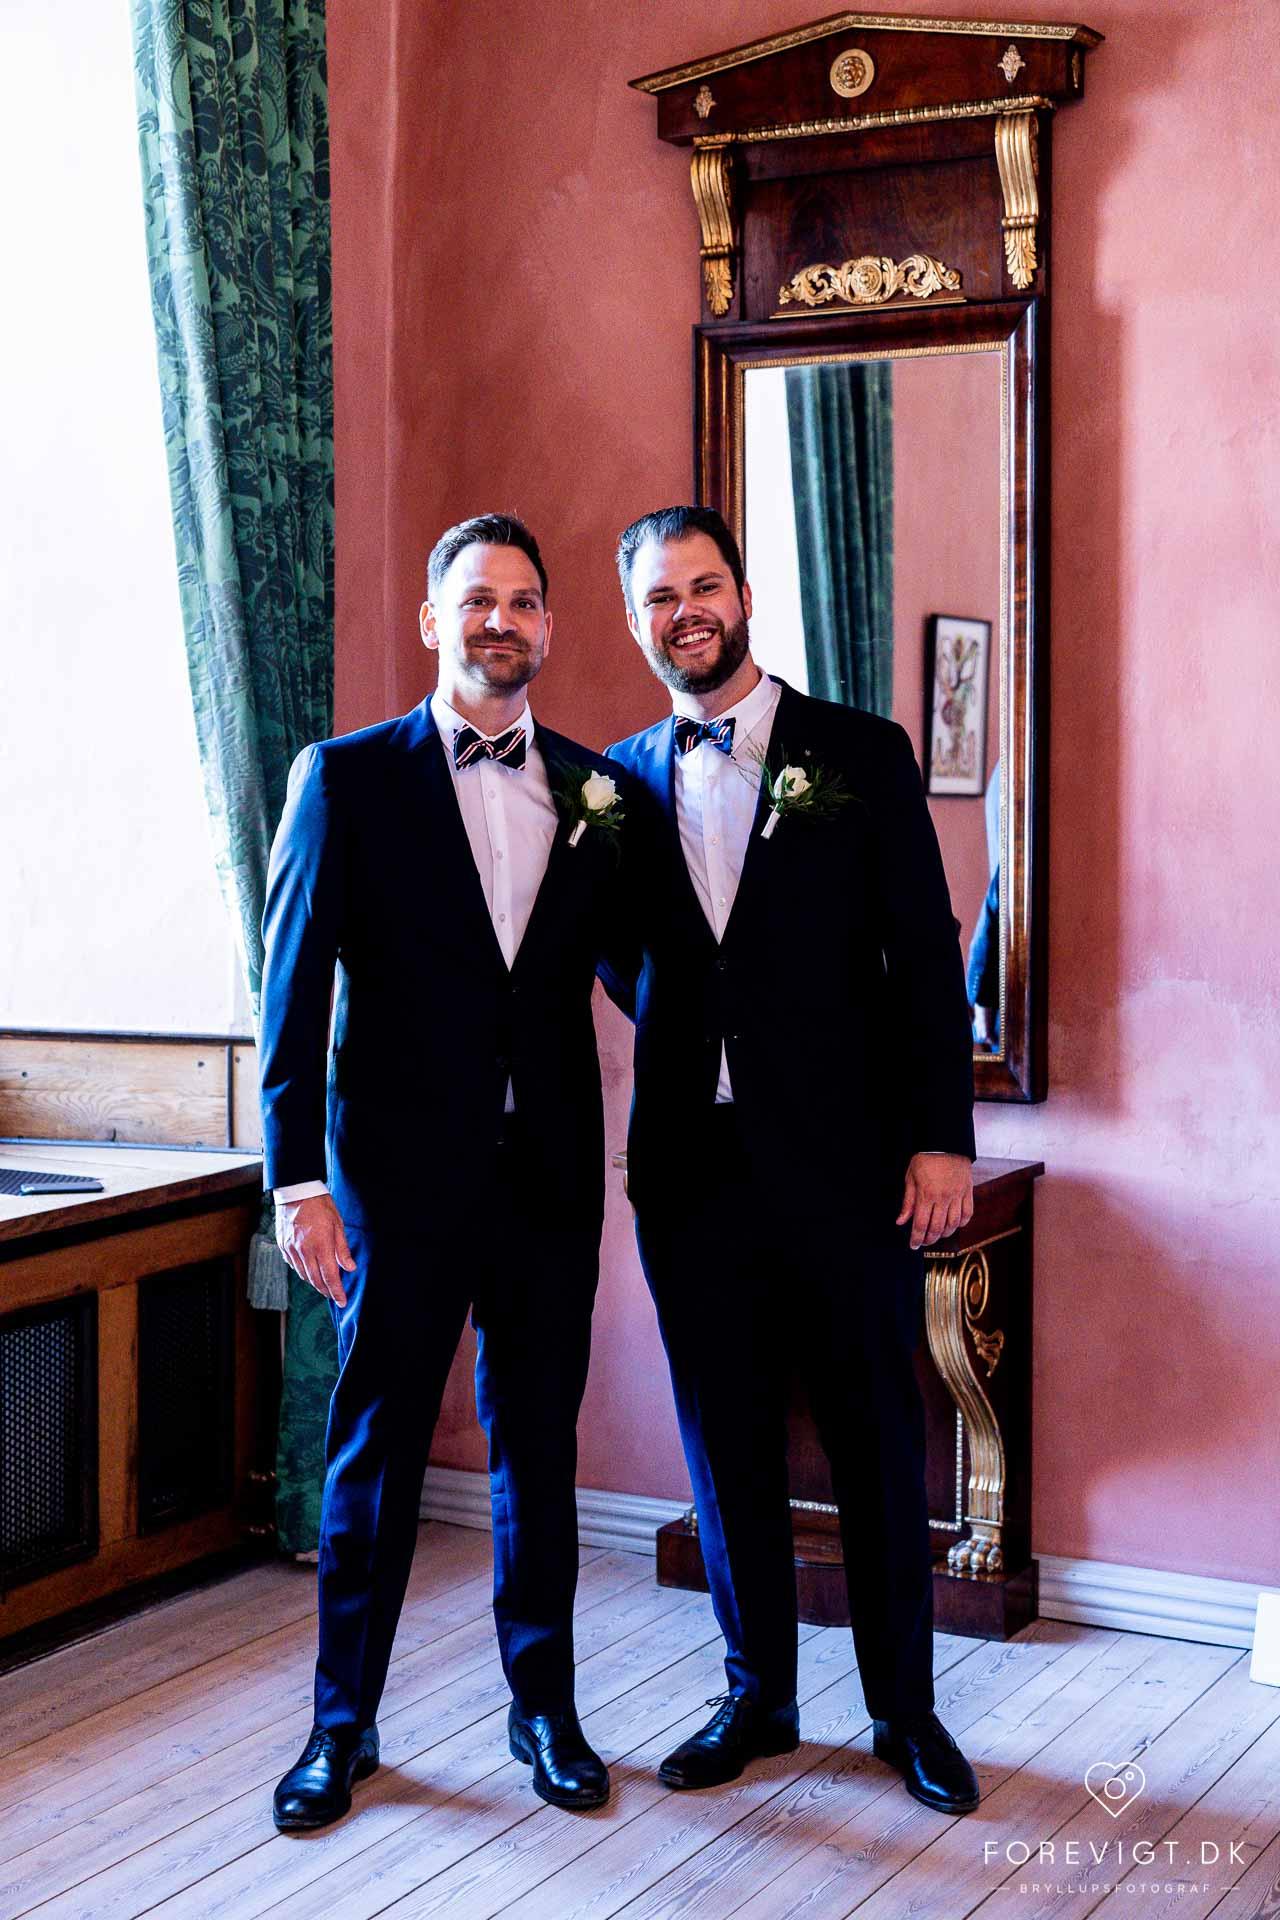 Slotsbryllup. Bryllup med vielse på slottet · Bryllupsfest i Clausholms festlokale